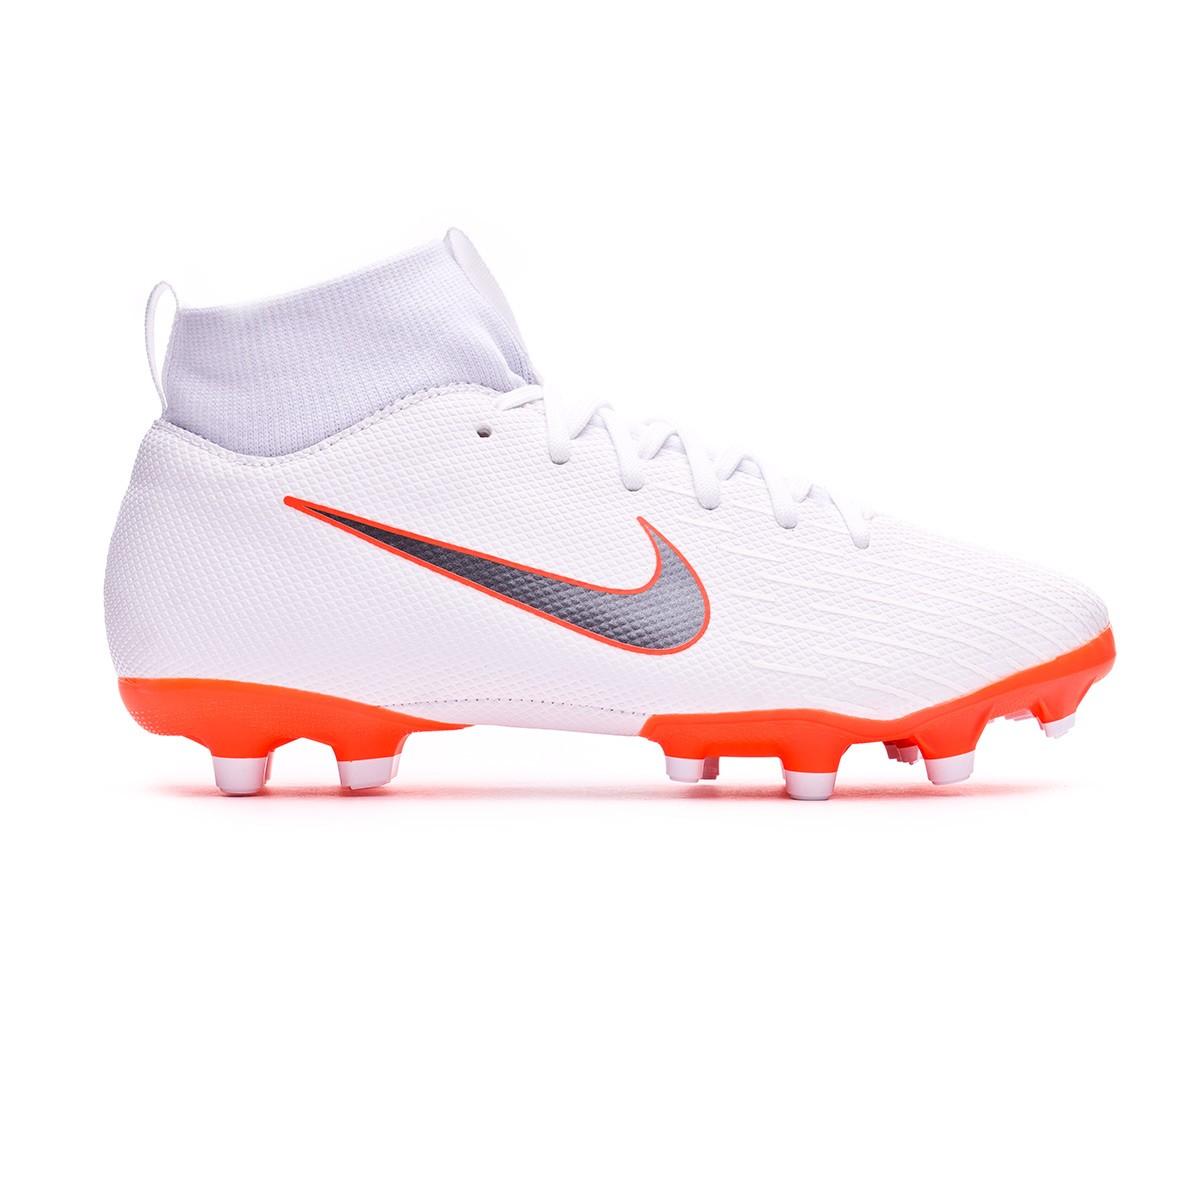 Chaussure de foot Nike Mercurial Superfly VI Academy GS MG enfant